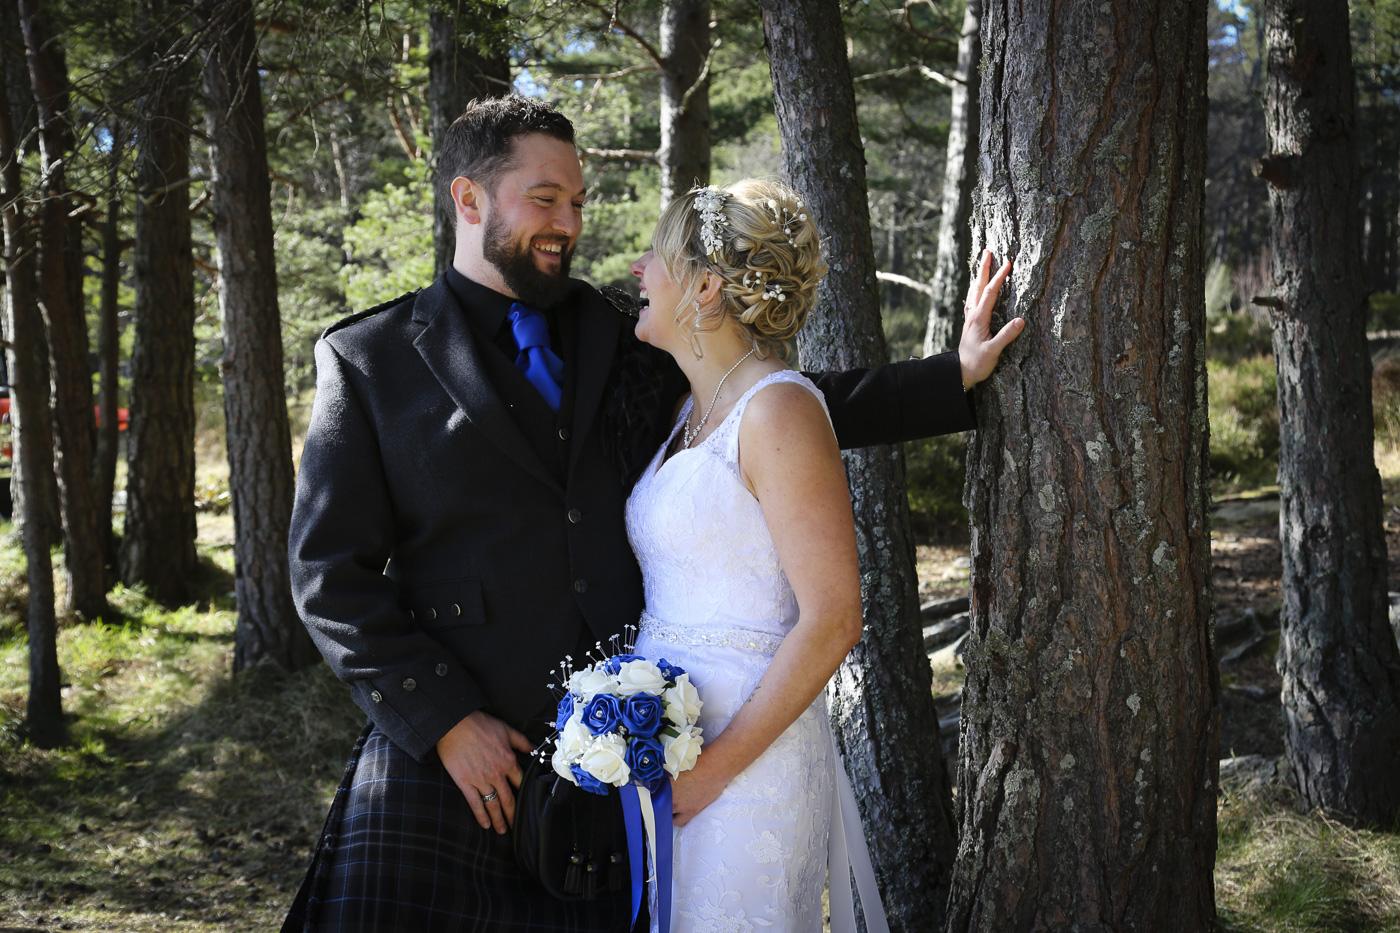 Wedding photography at The Hilton Coylumbridge and Loch Morlich-0120